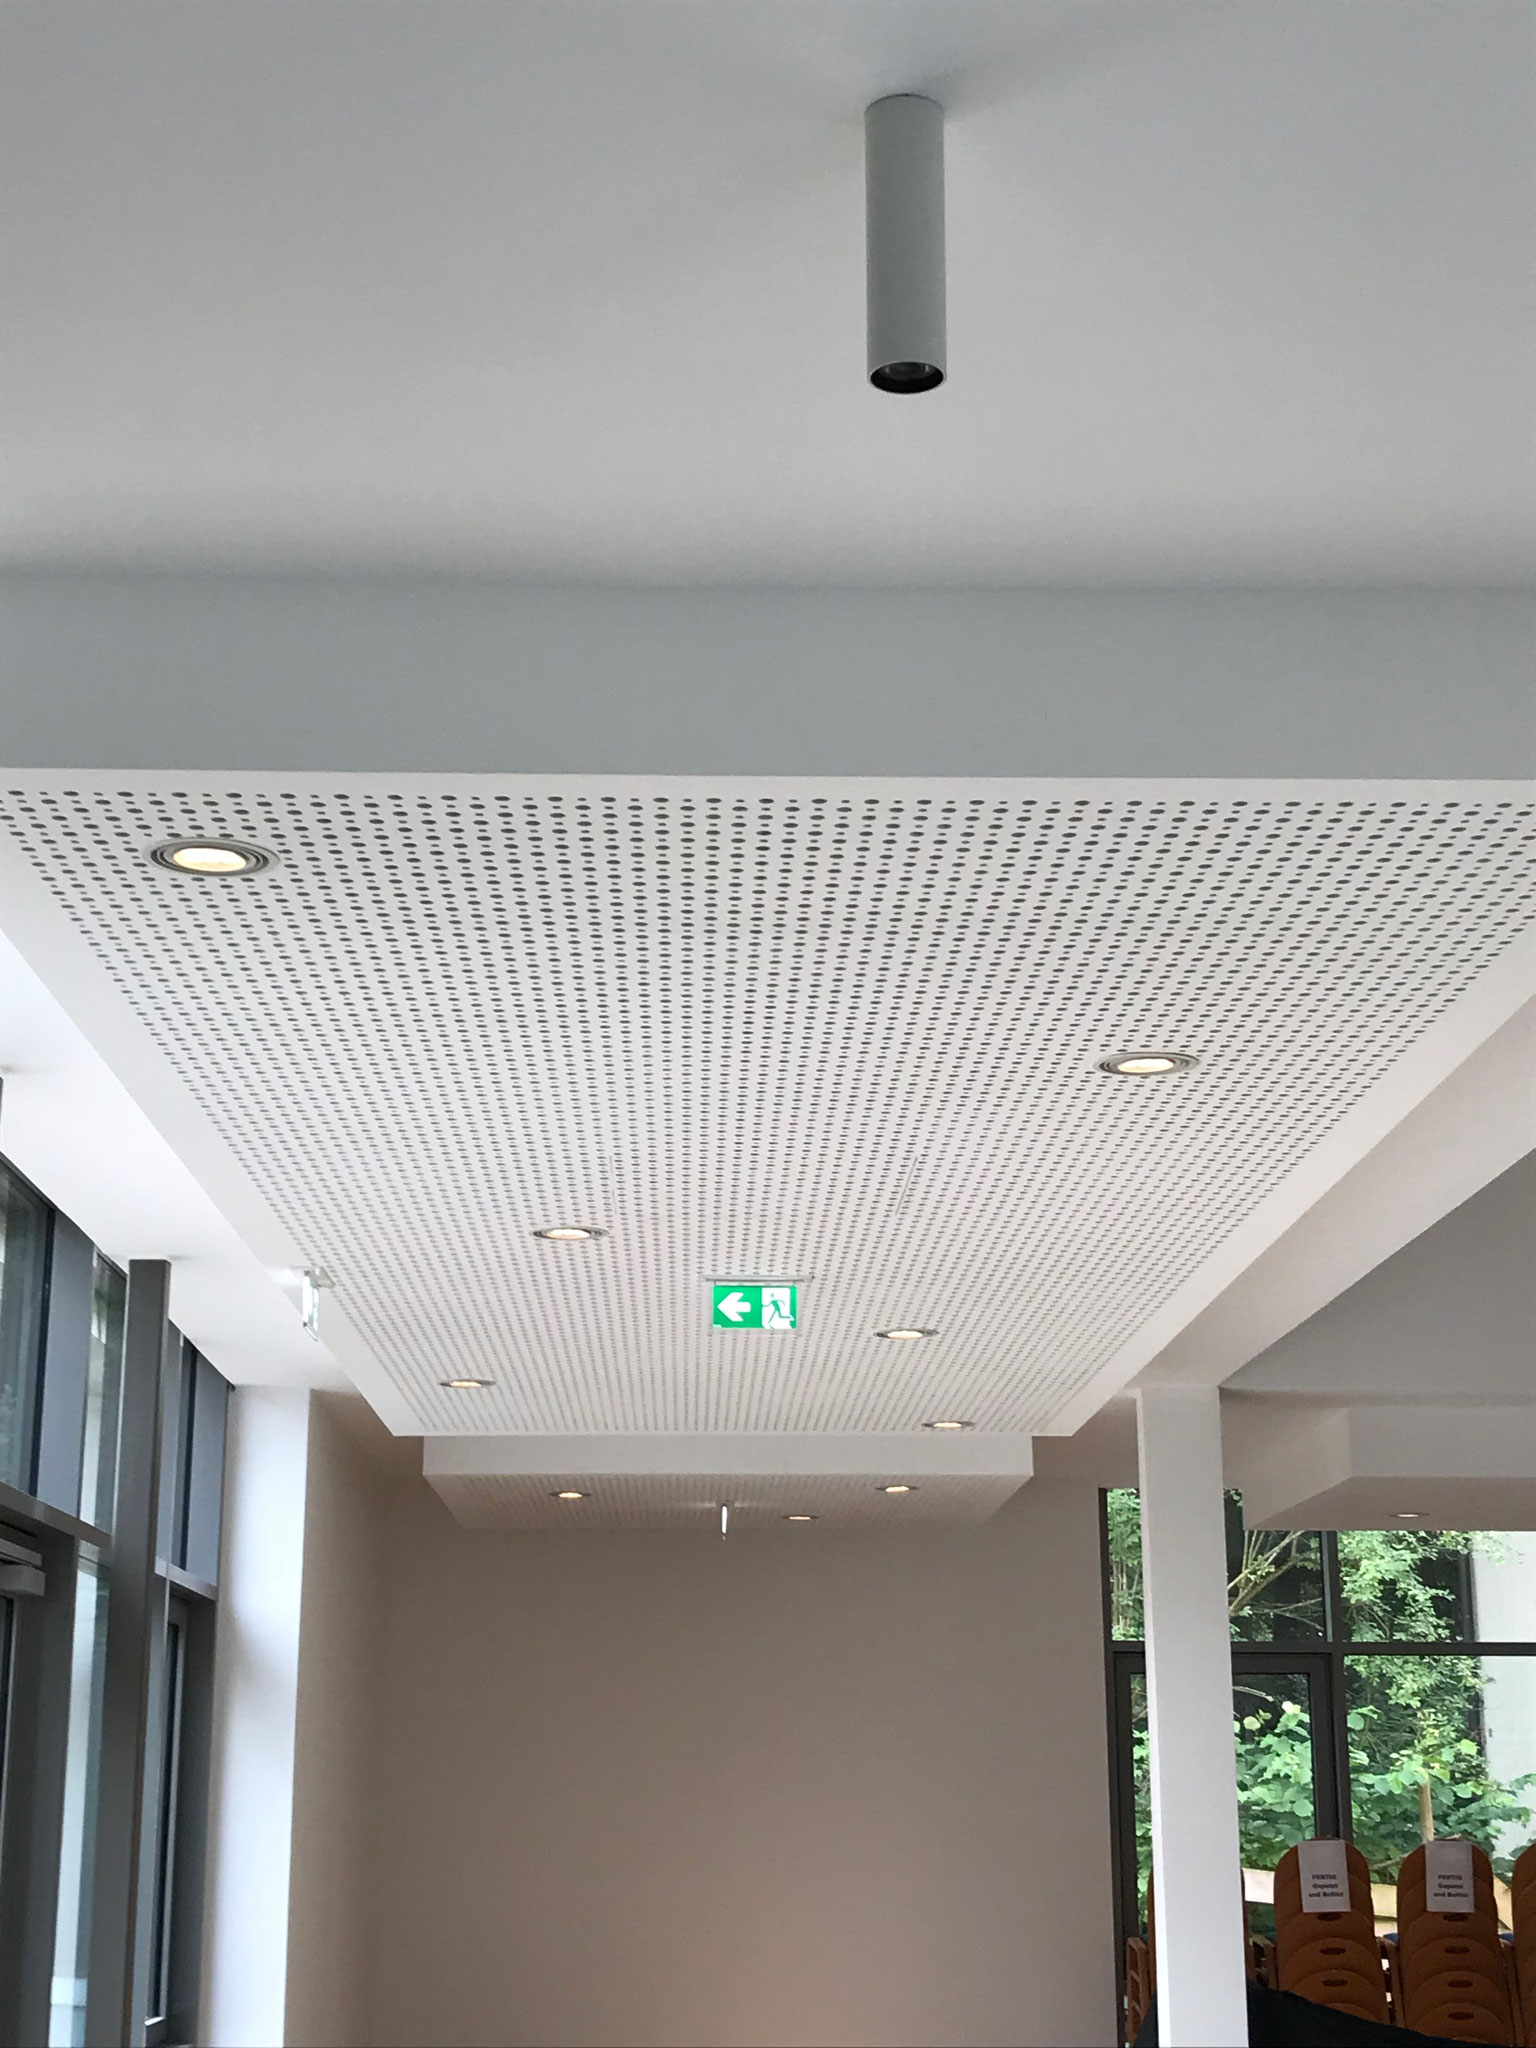 Projekt in Solingen: Akustik-Design-Decken im Hörsaal